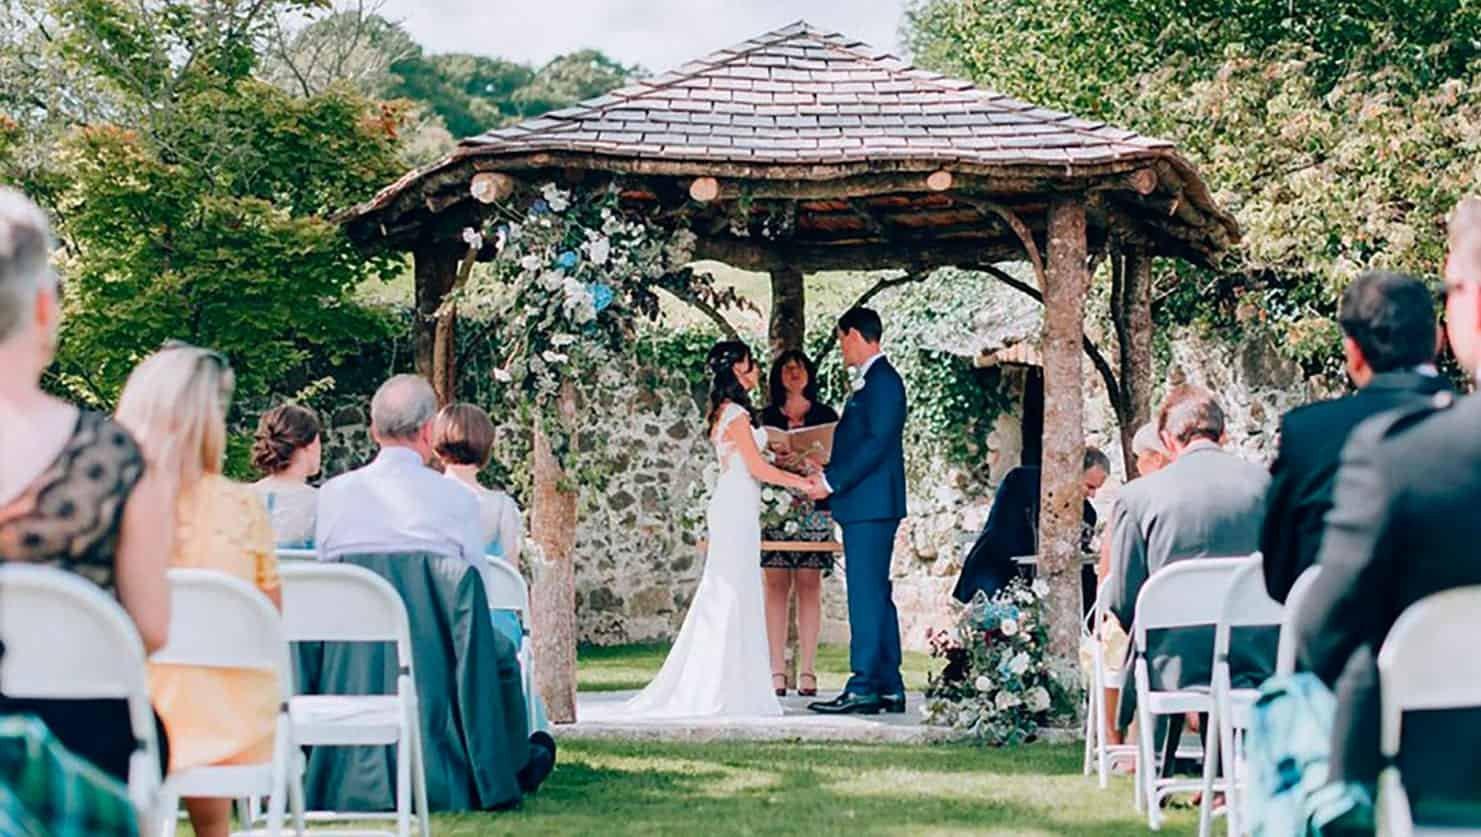 Wedding Arbour, Great Barn Devon